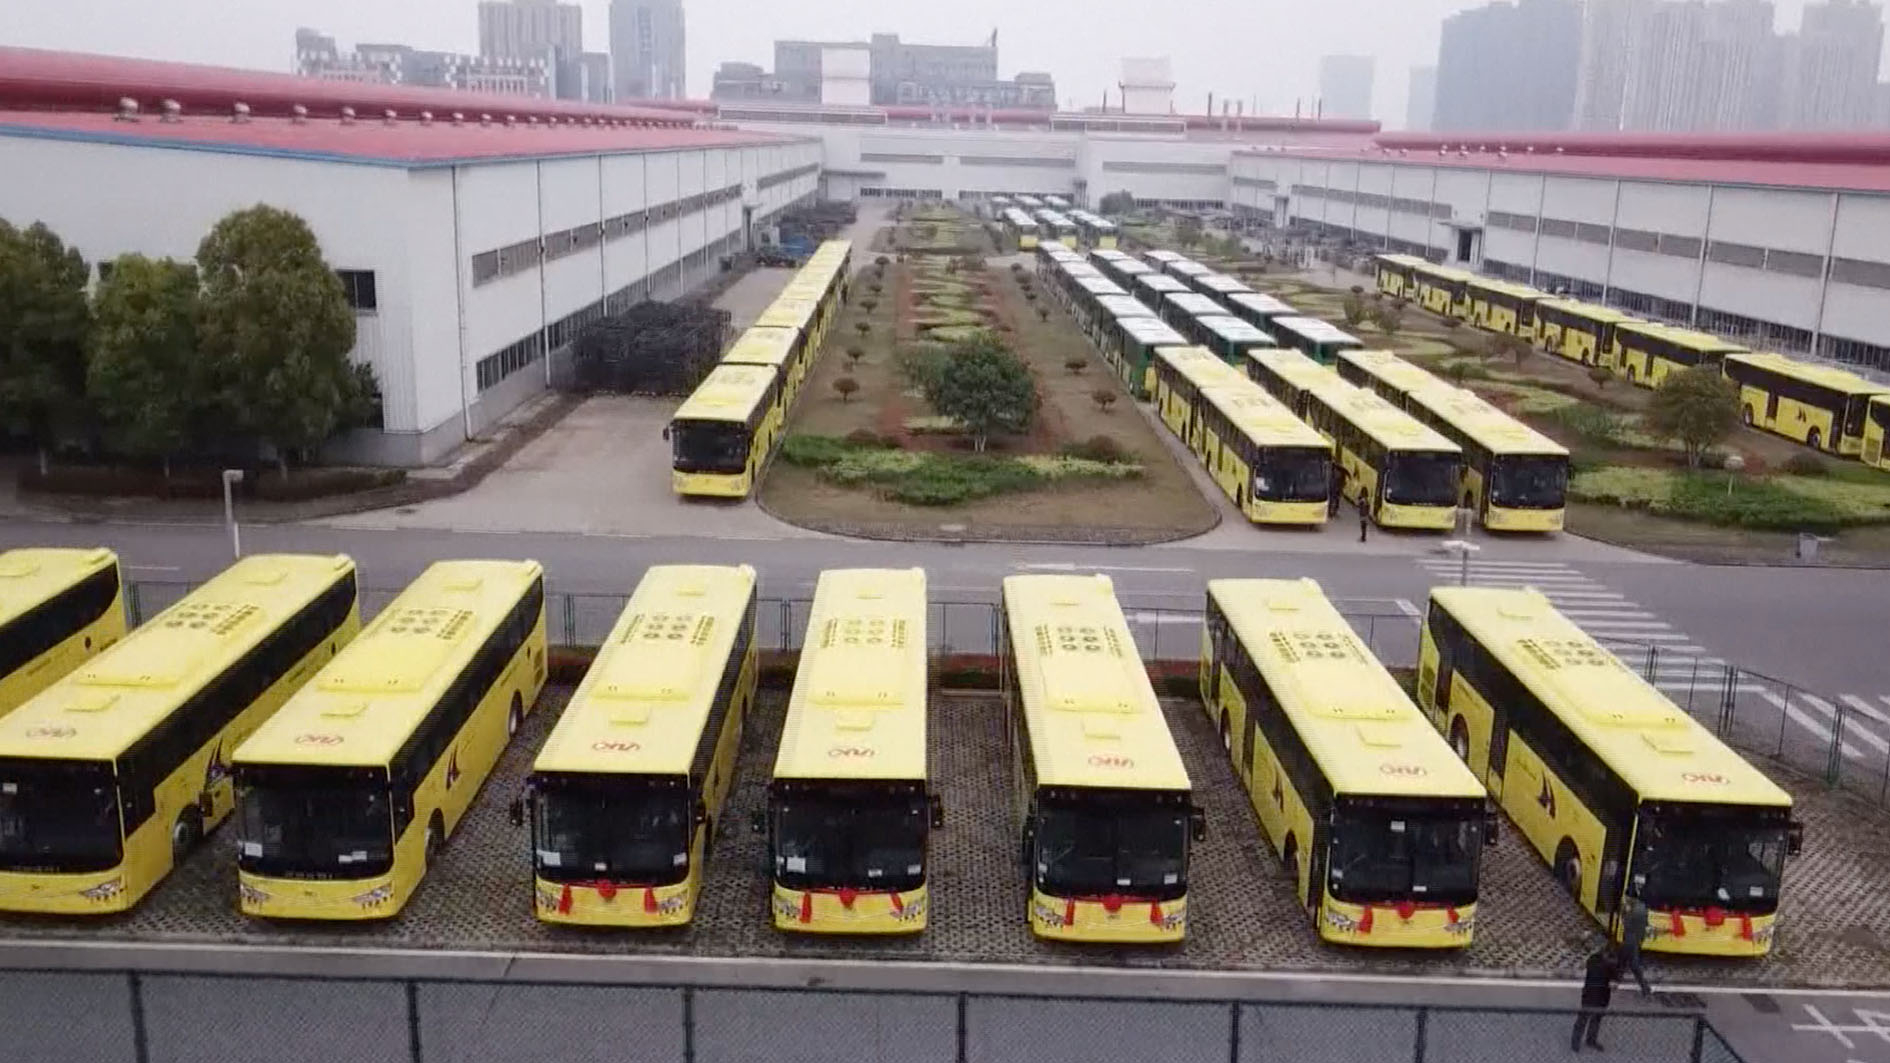 Chinese company exports 213 buses to Saudi Arabia